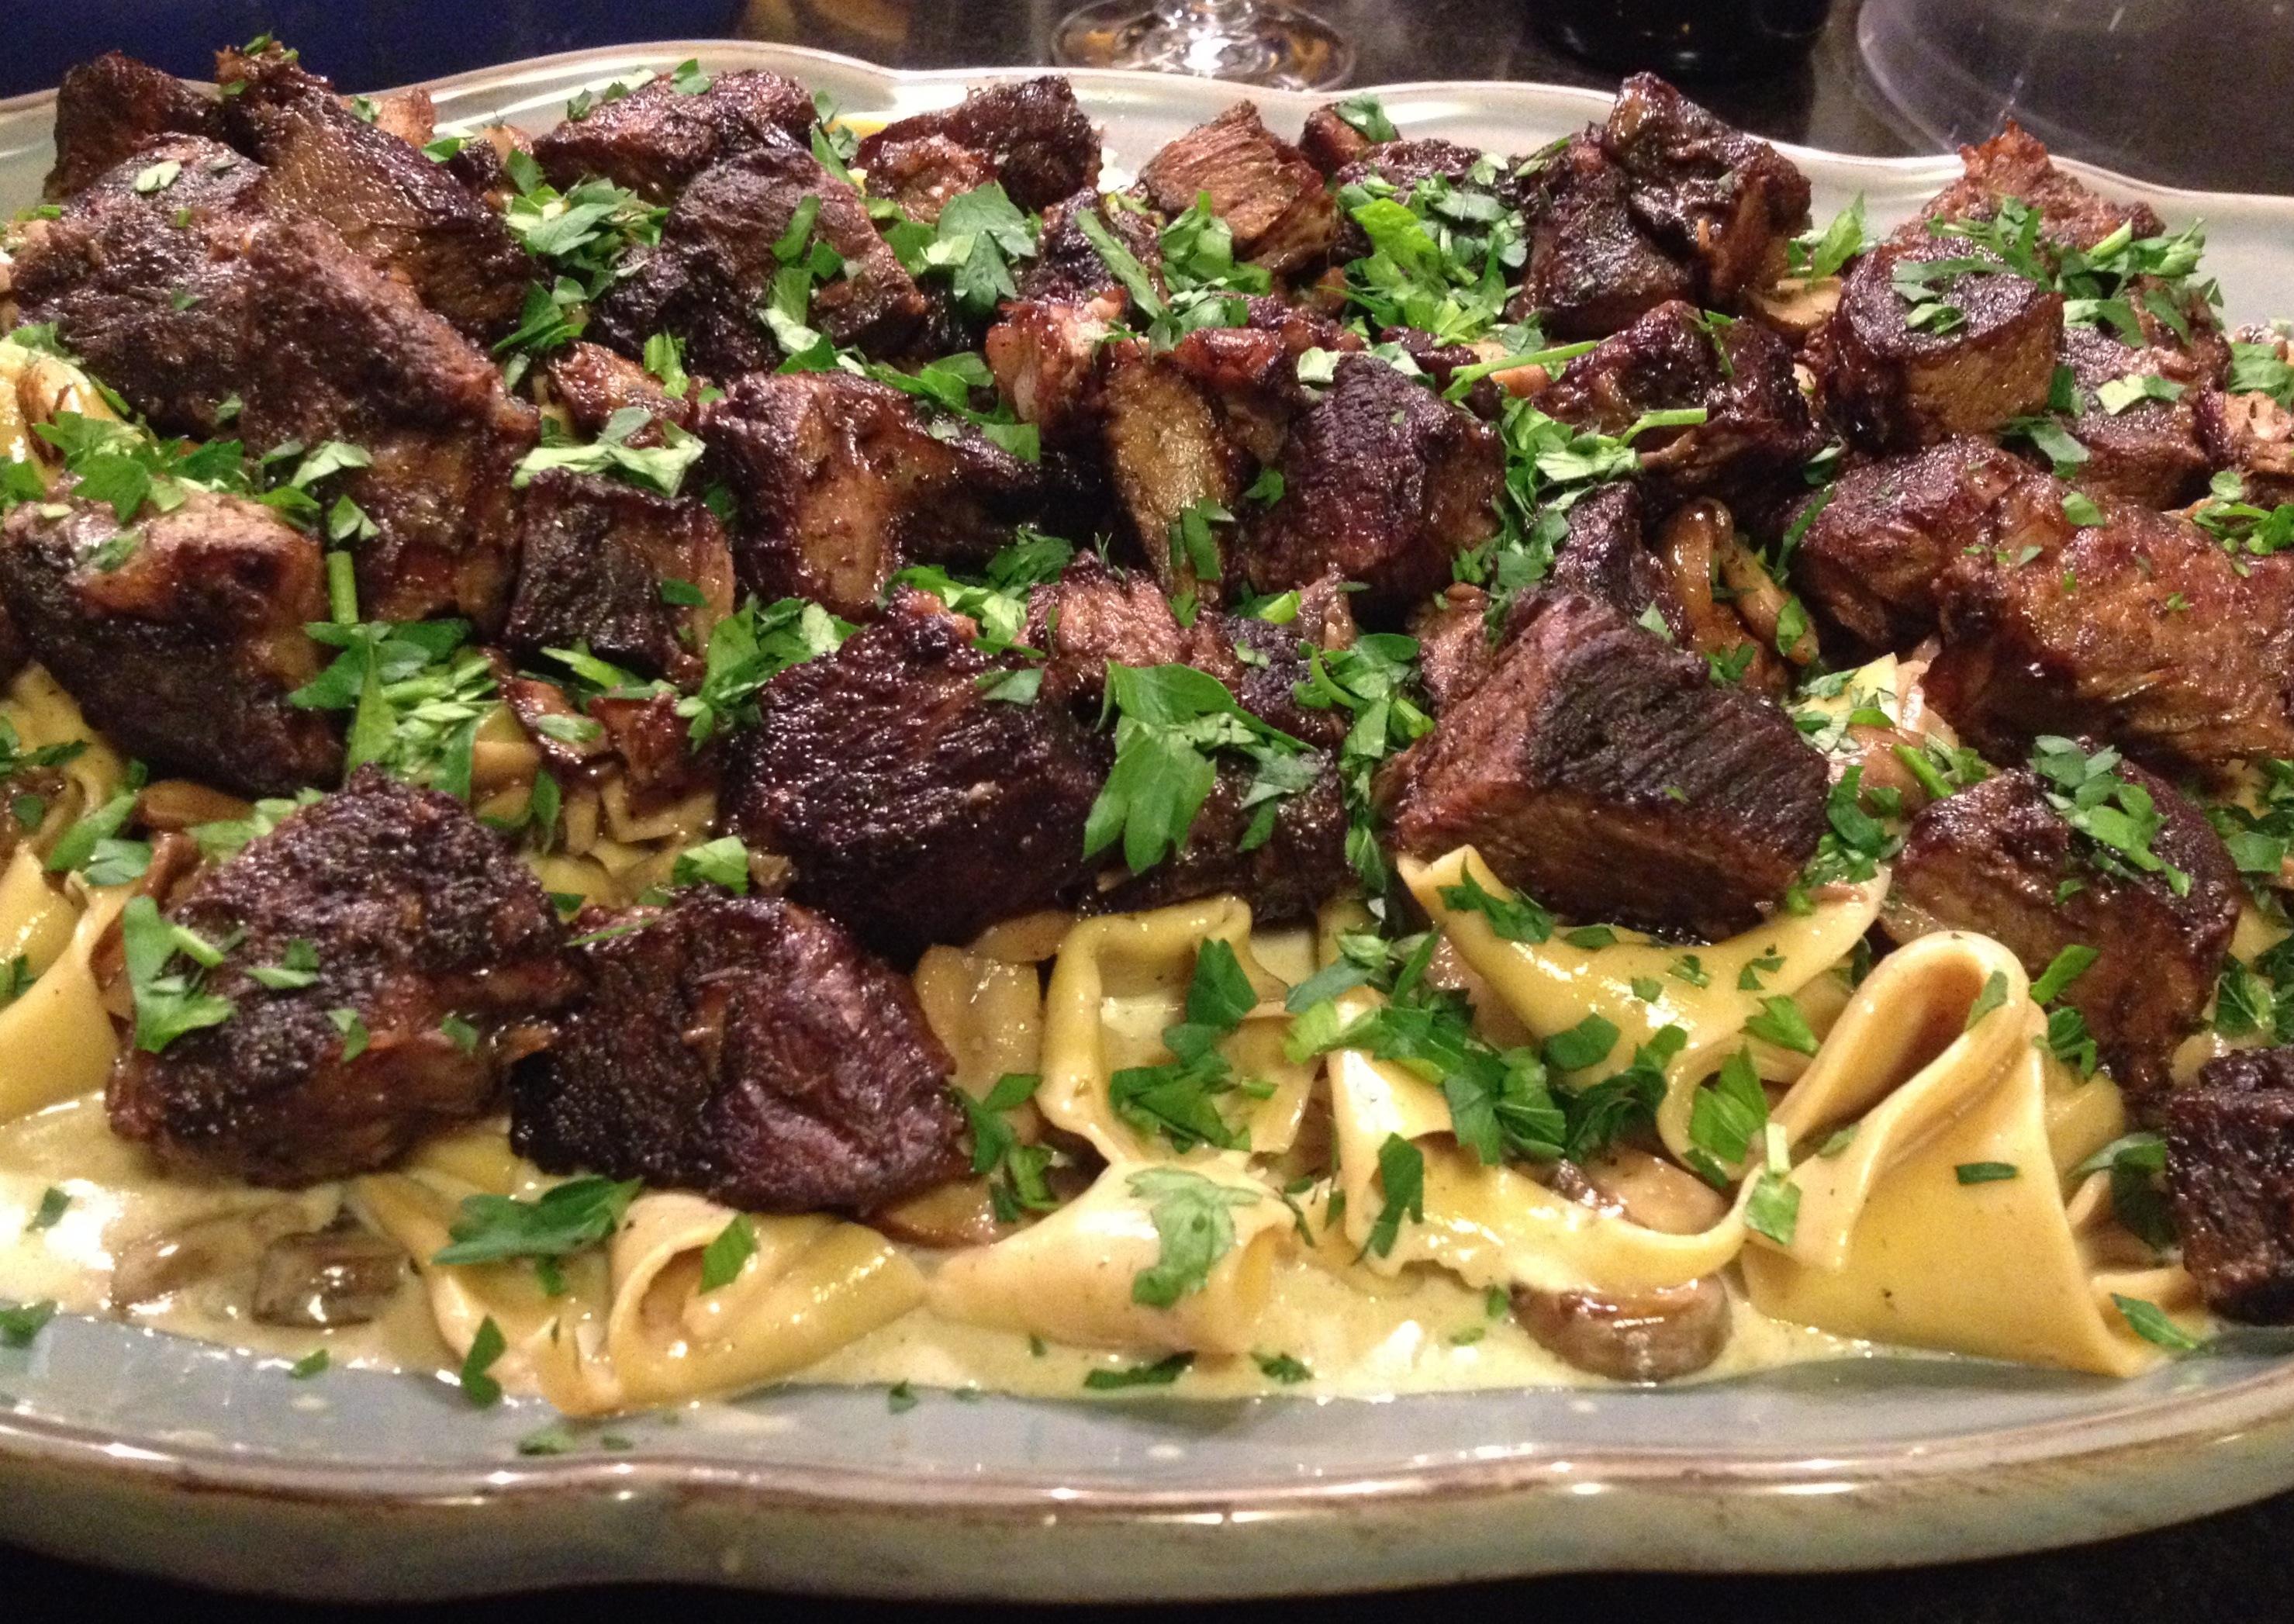 Beef stroganoff side view platter